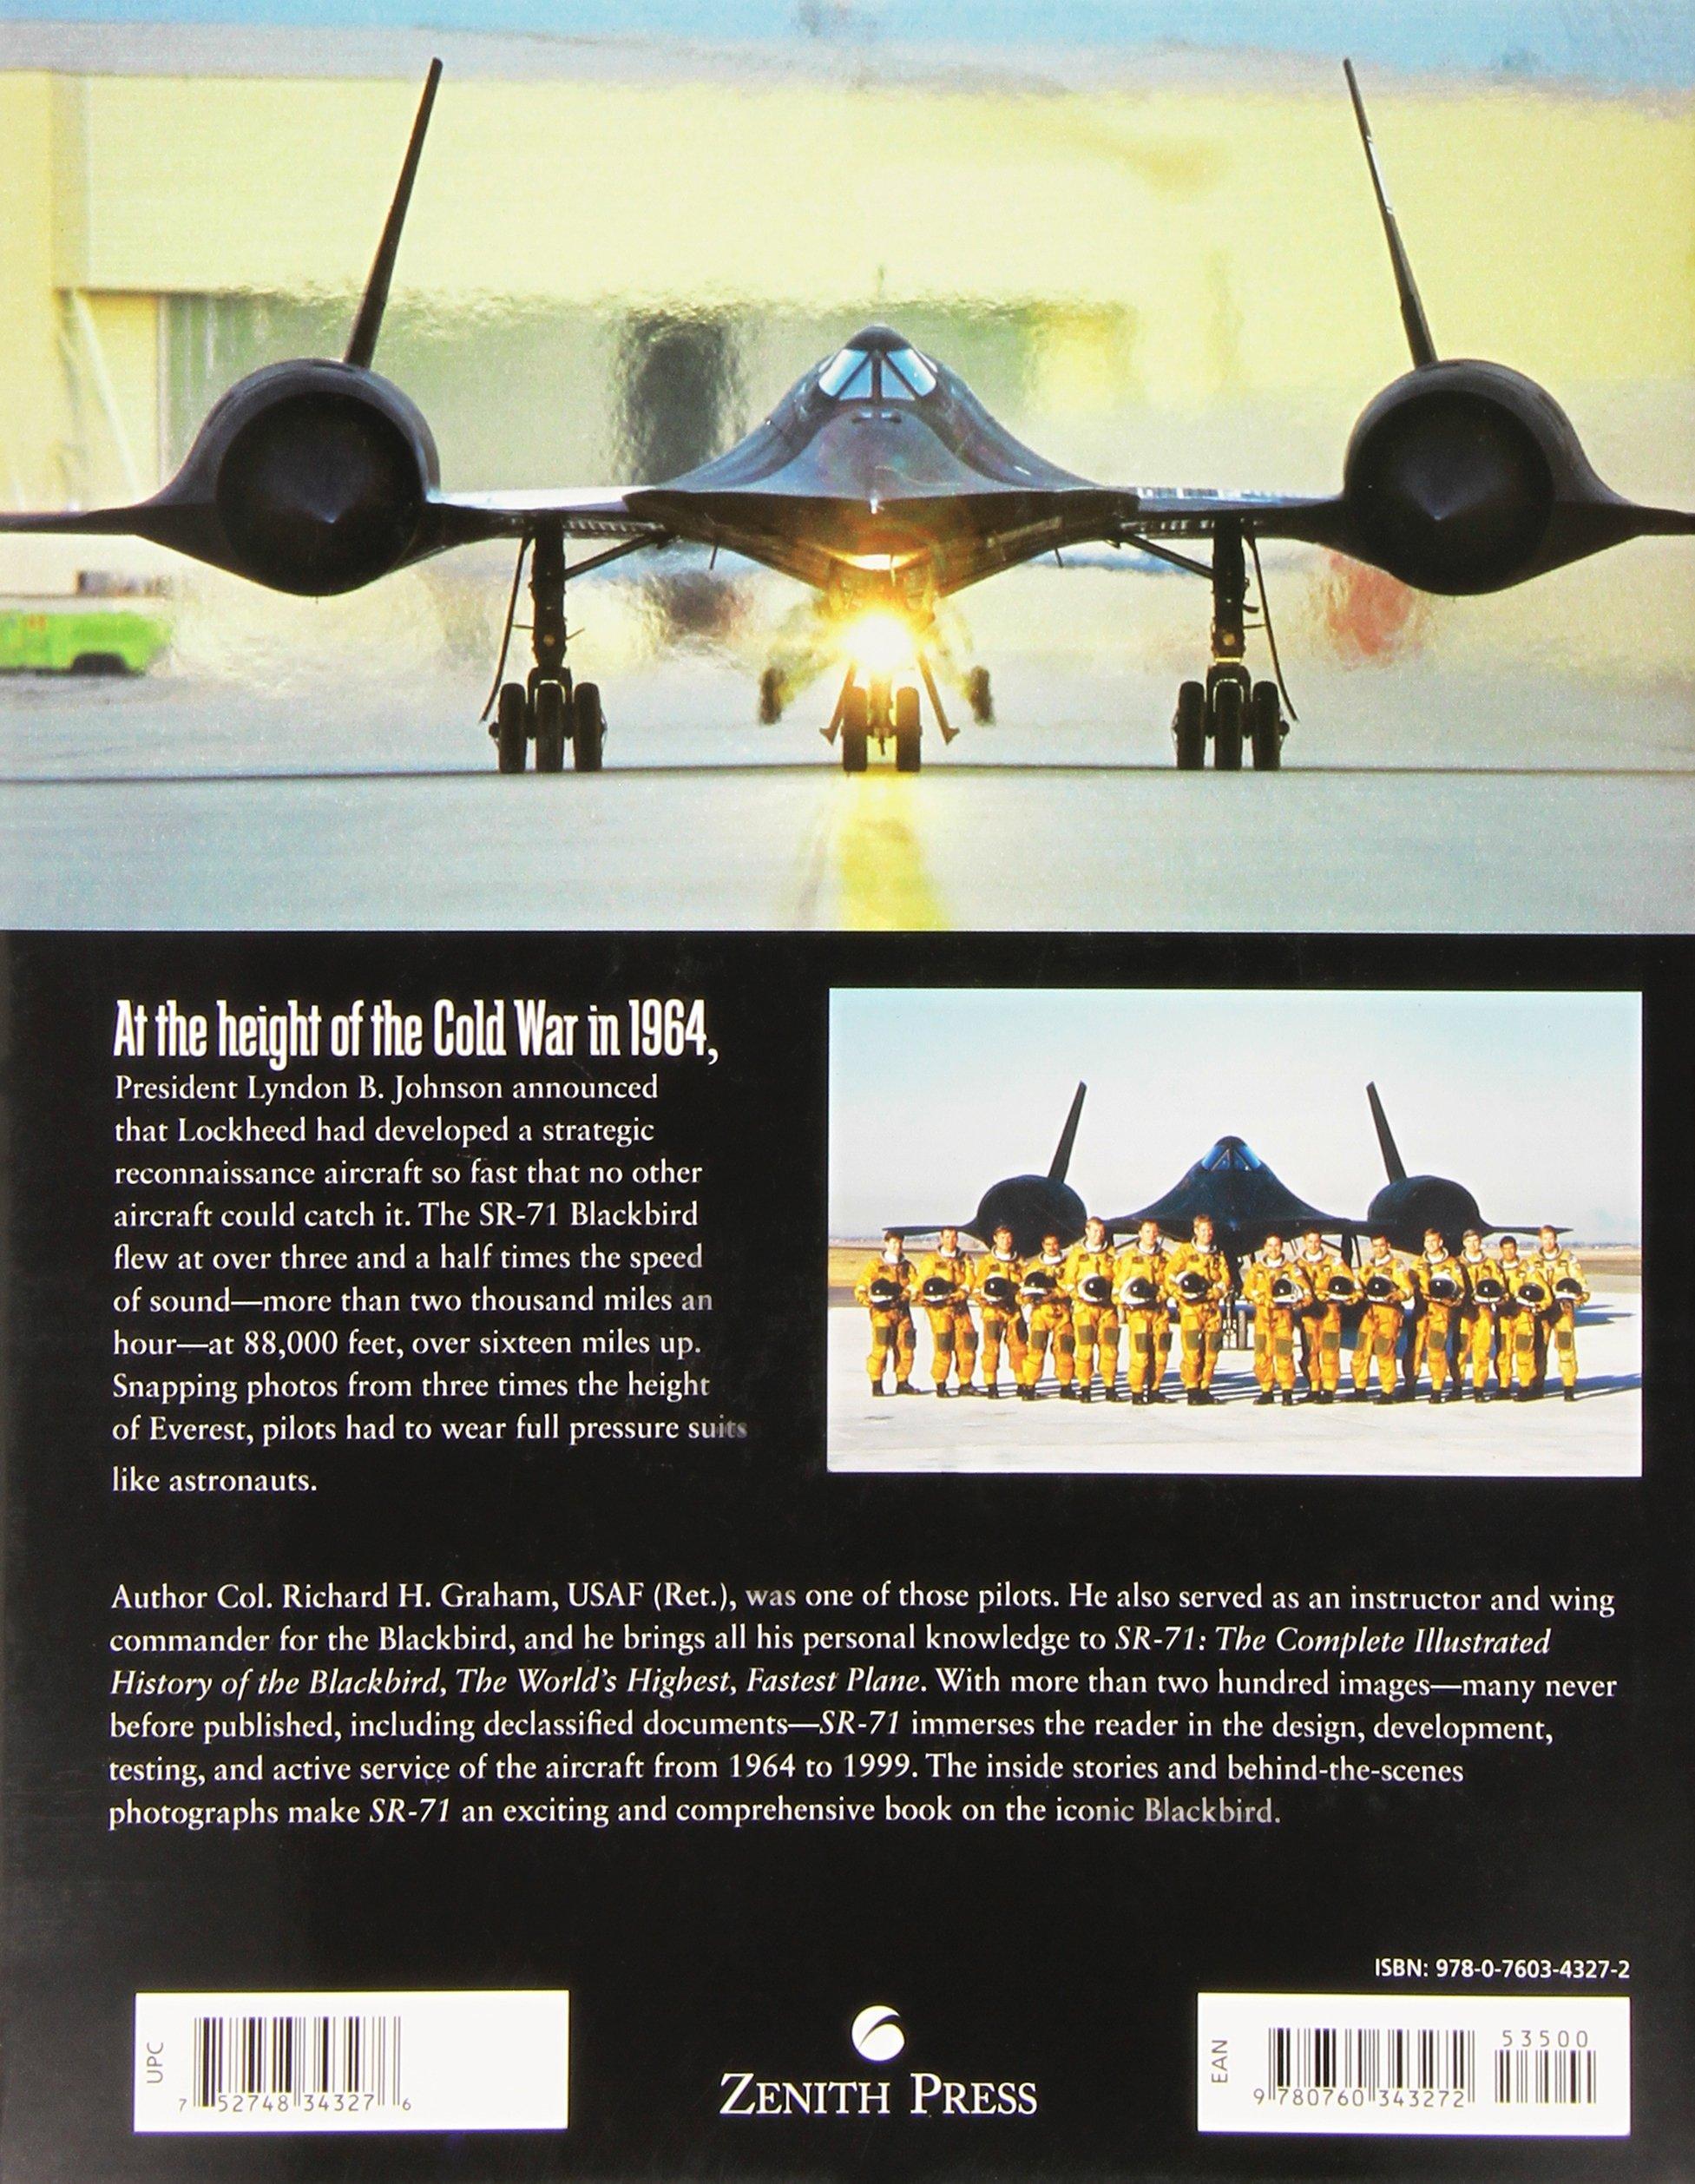 SR-71: The Complete Illustrated History of the Blackbird, The World's  Highest, Fastest Plane: Col. Richard H. Graham: 9780760343272: Amazon.com:  Books